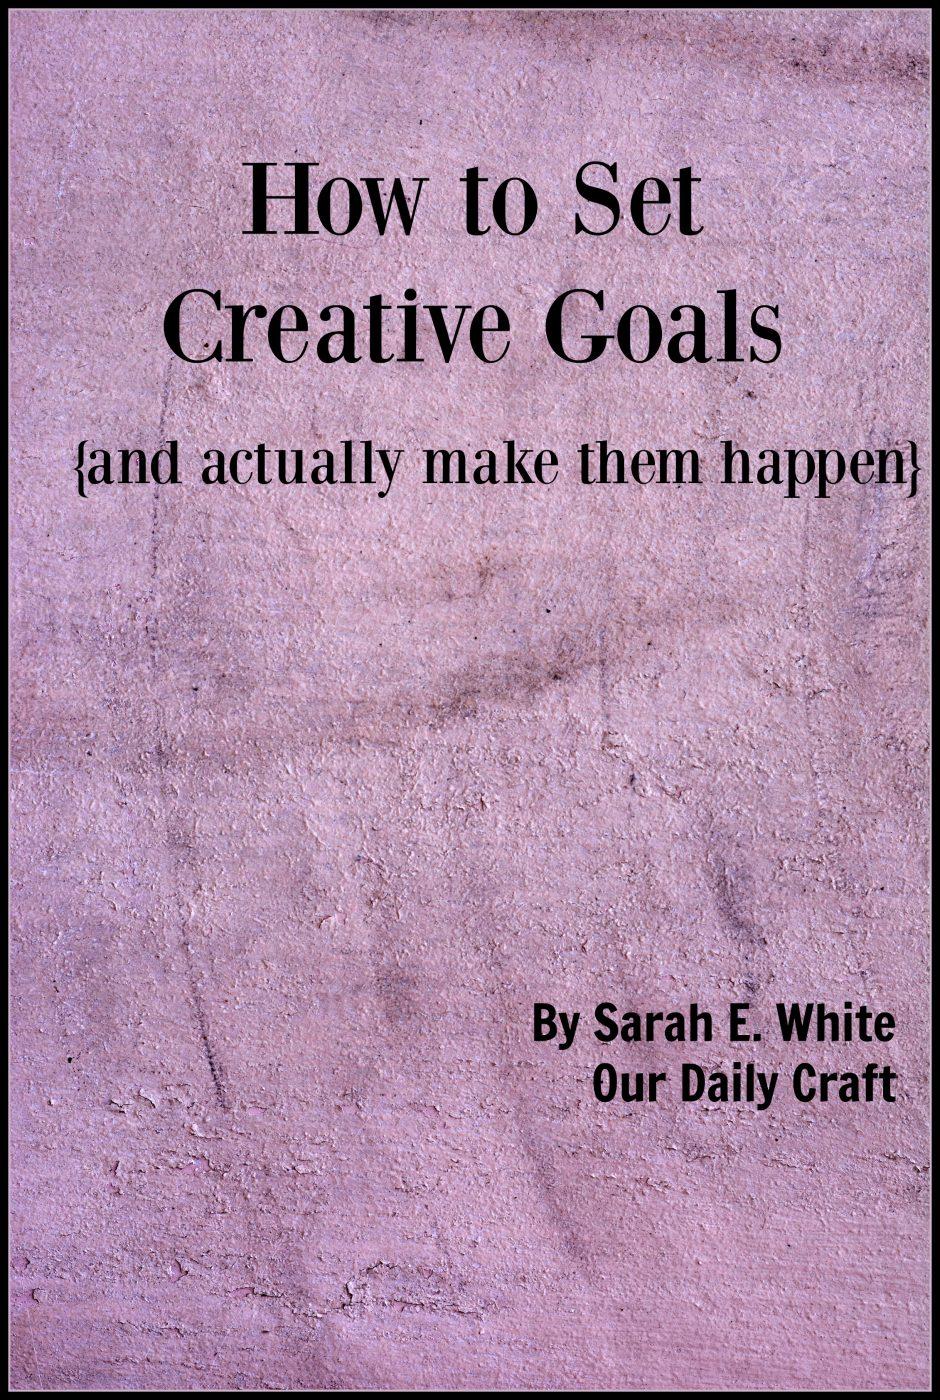 How to Set Creative Goals ebook